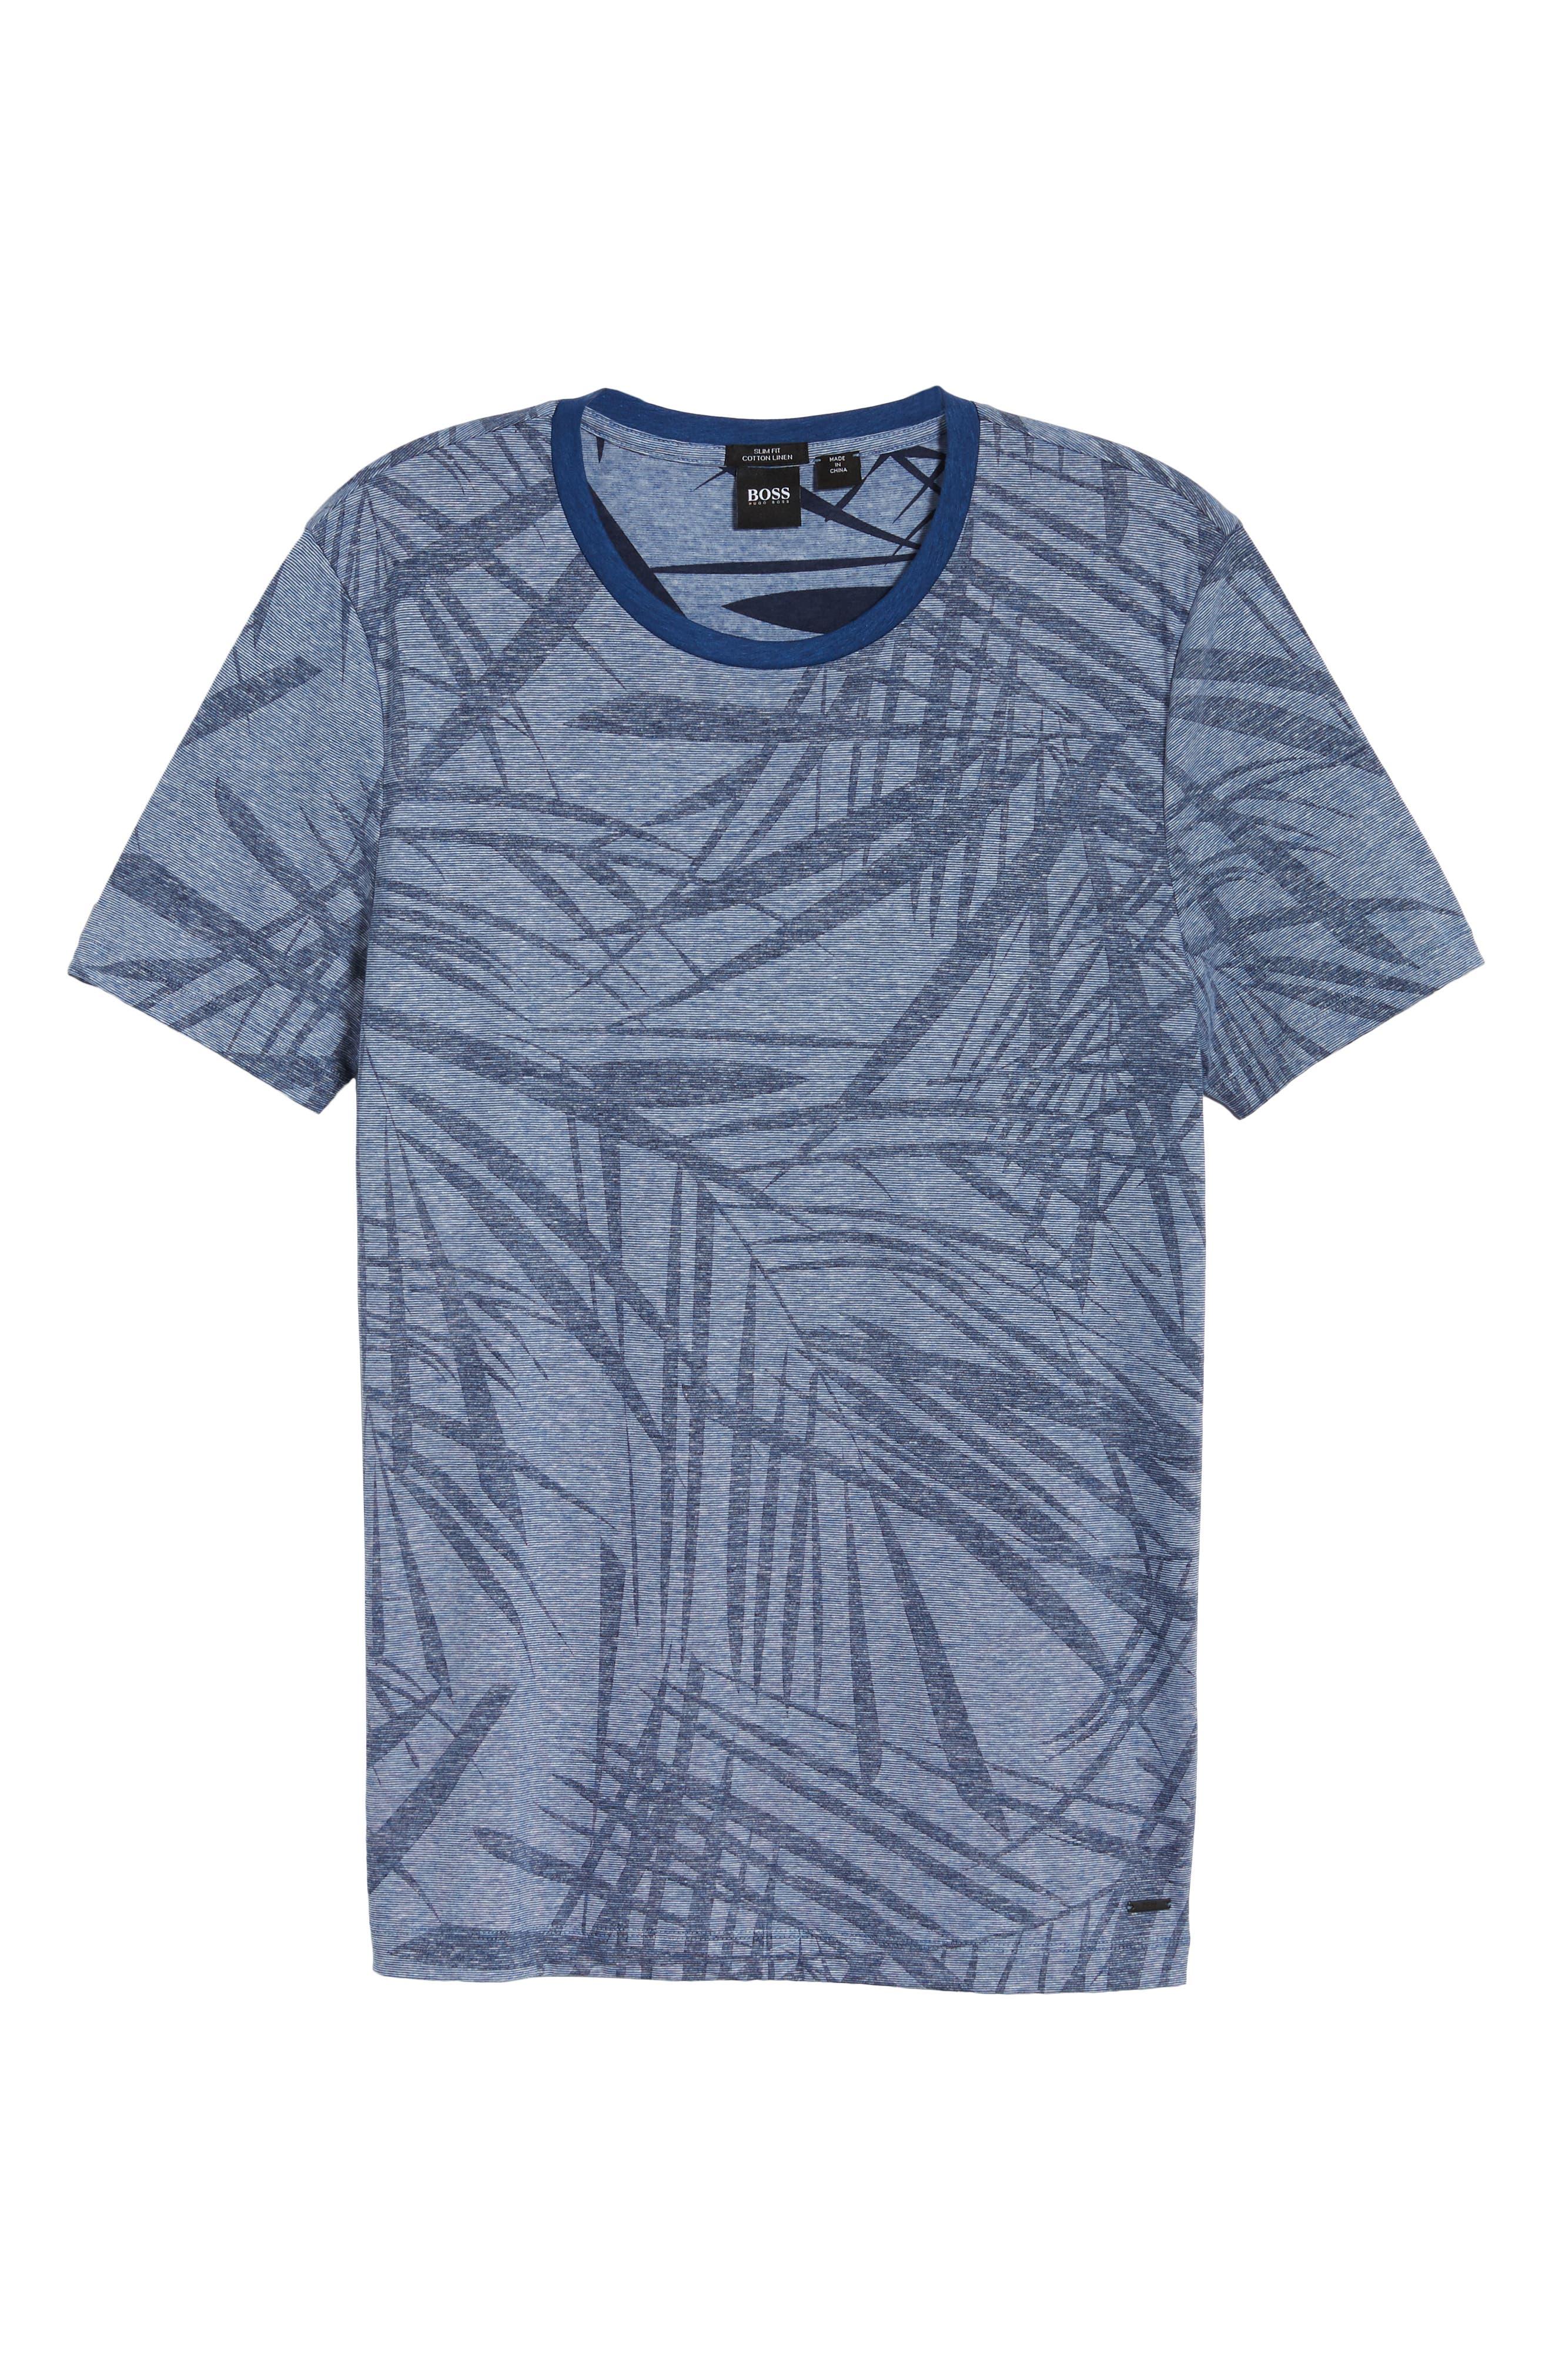 Tessler Slim Fit Palm Print T-Shirt,                             Alternate thumbnail 6, color,                             429